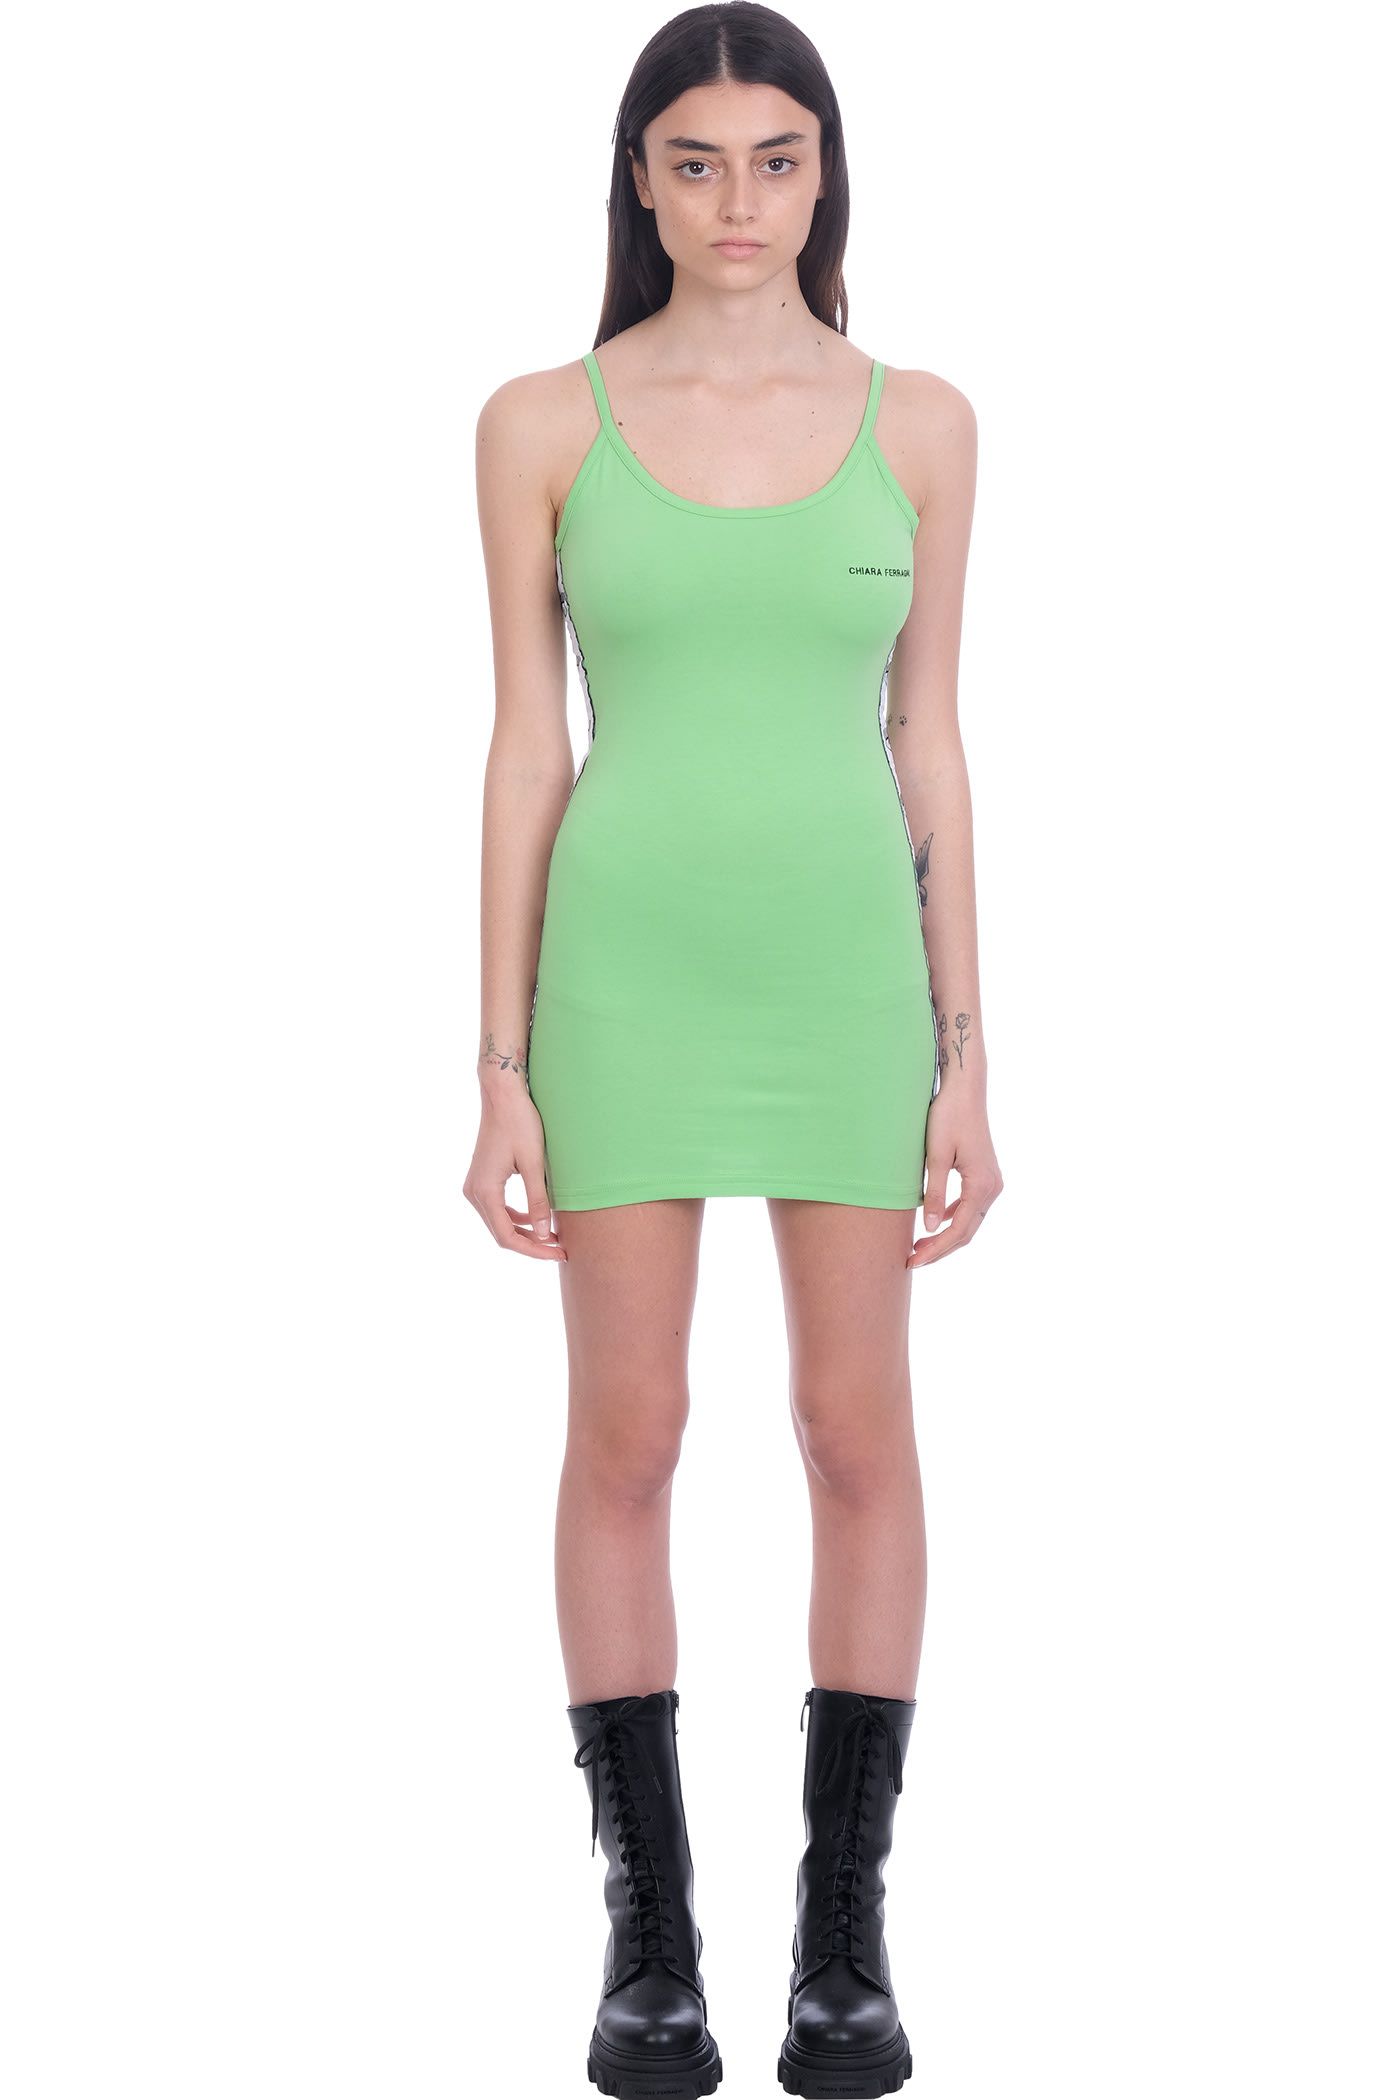 Buy Chiara Ferragni Dress In Green Cotton online, shop Chiara Ferragni with free shipping